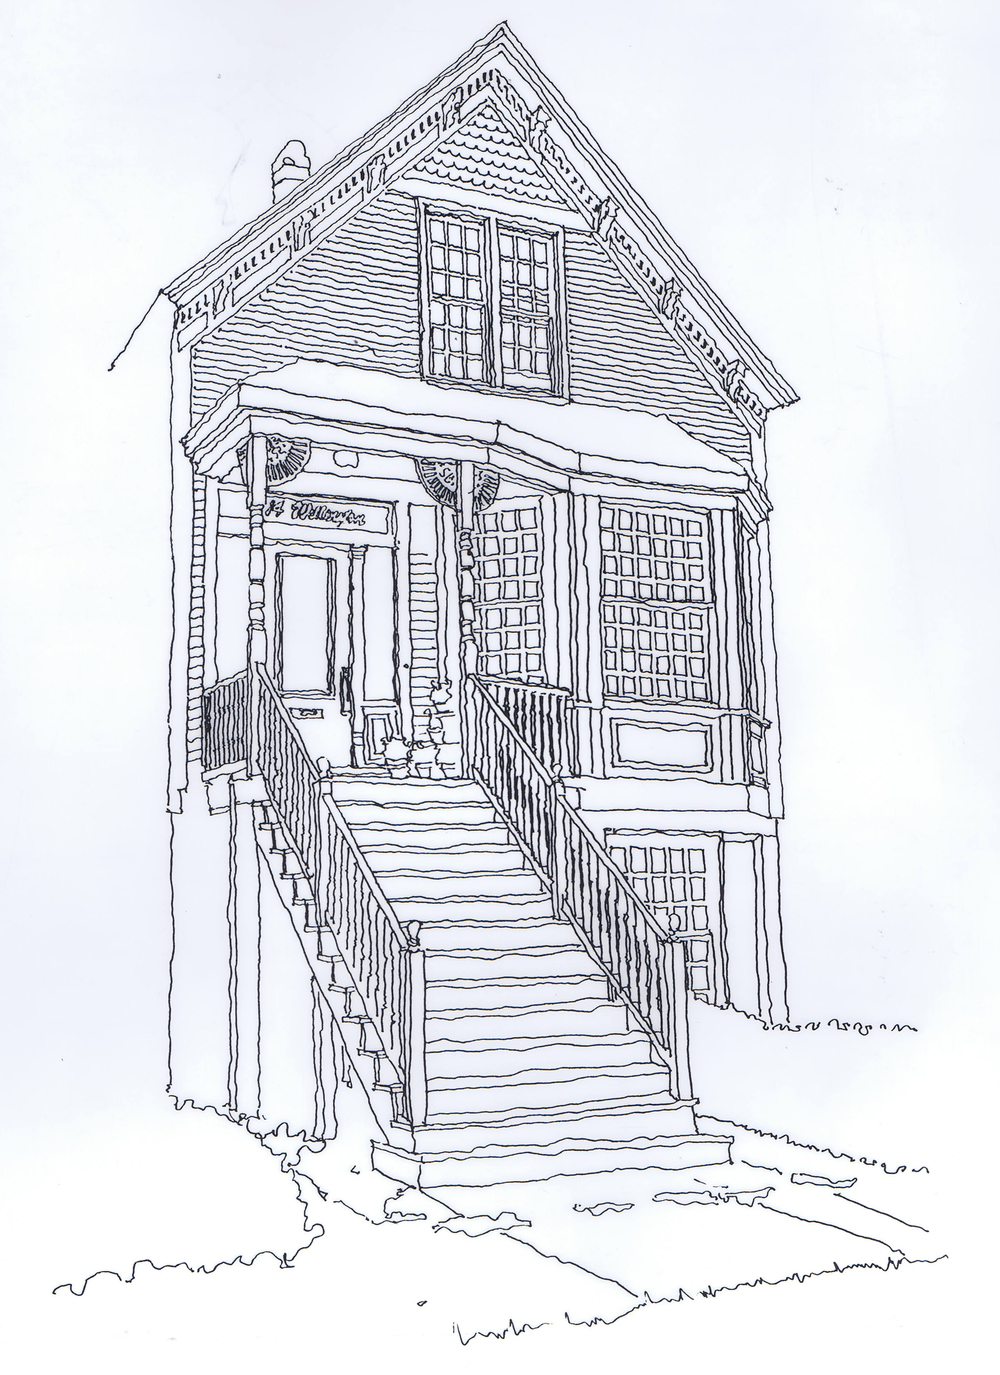 KR006 exterior sketch.jpg